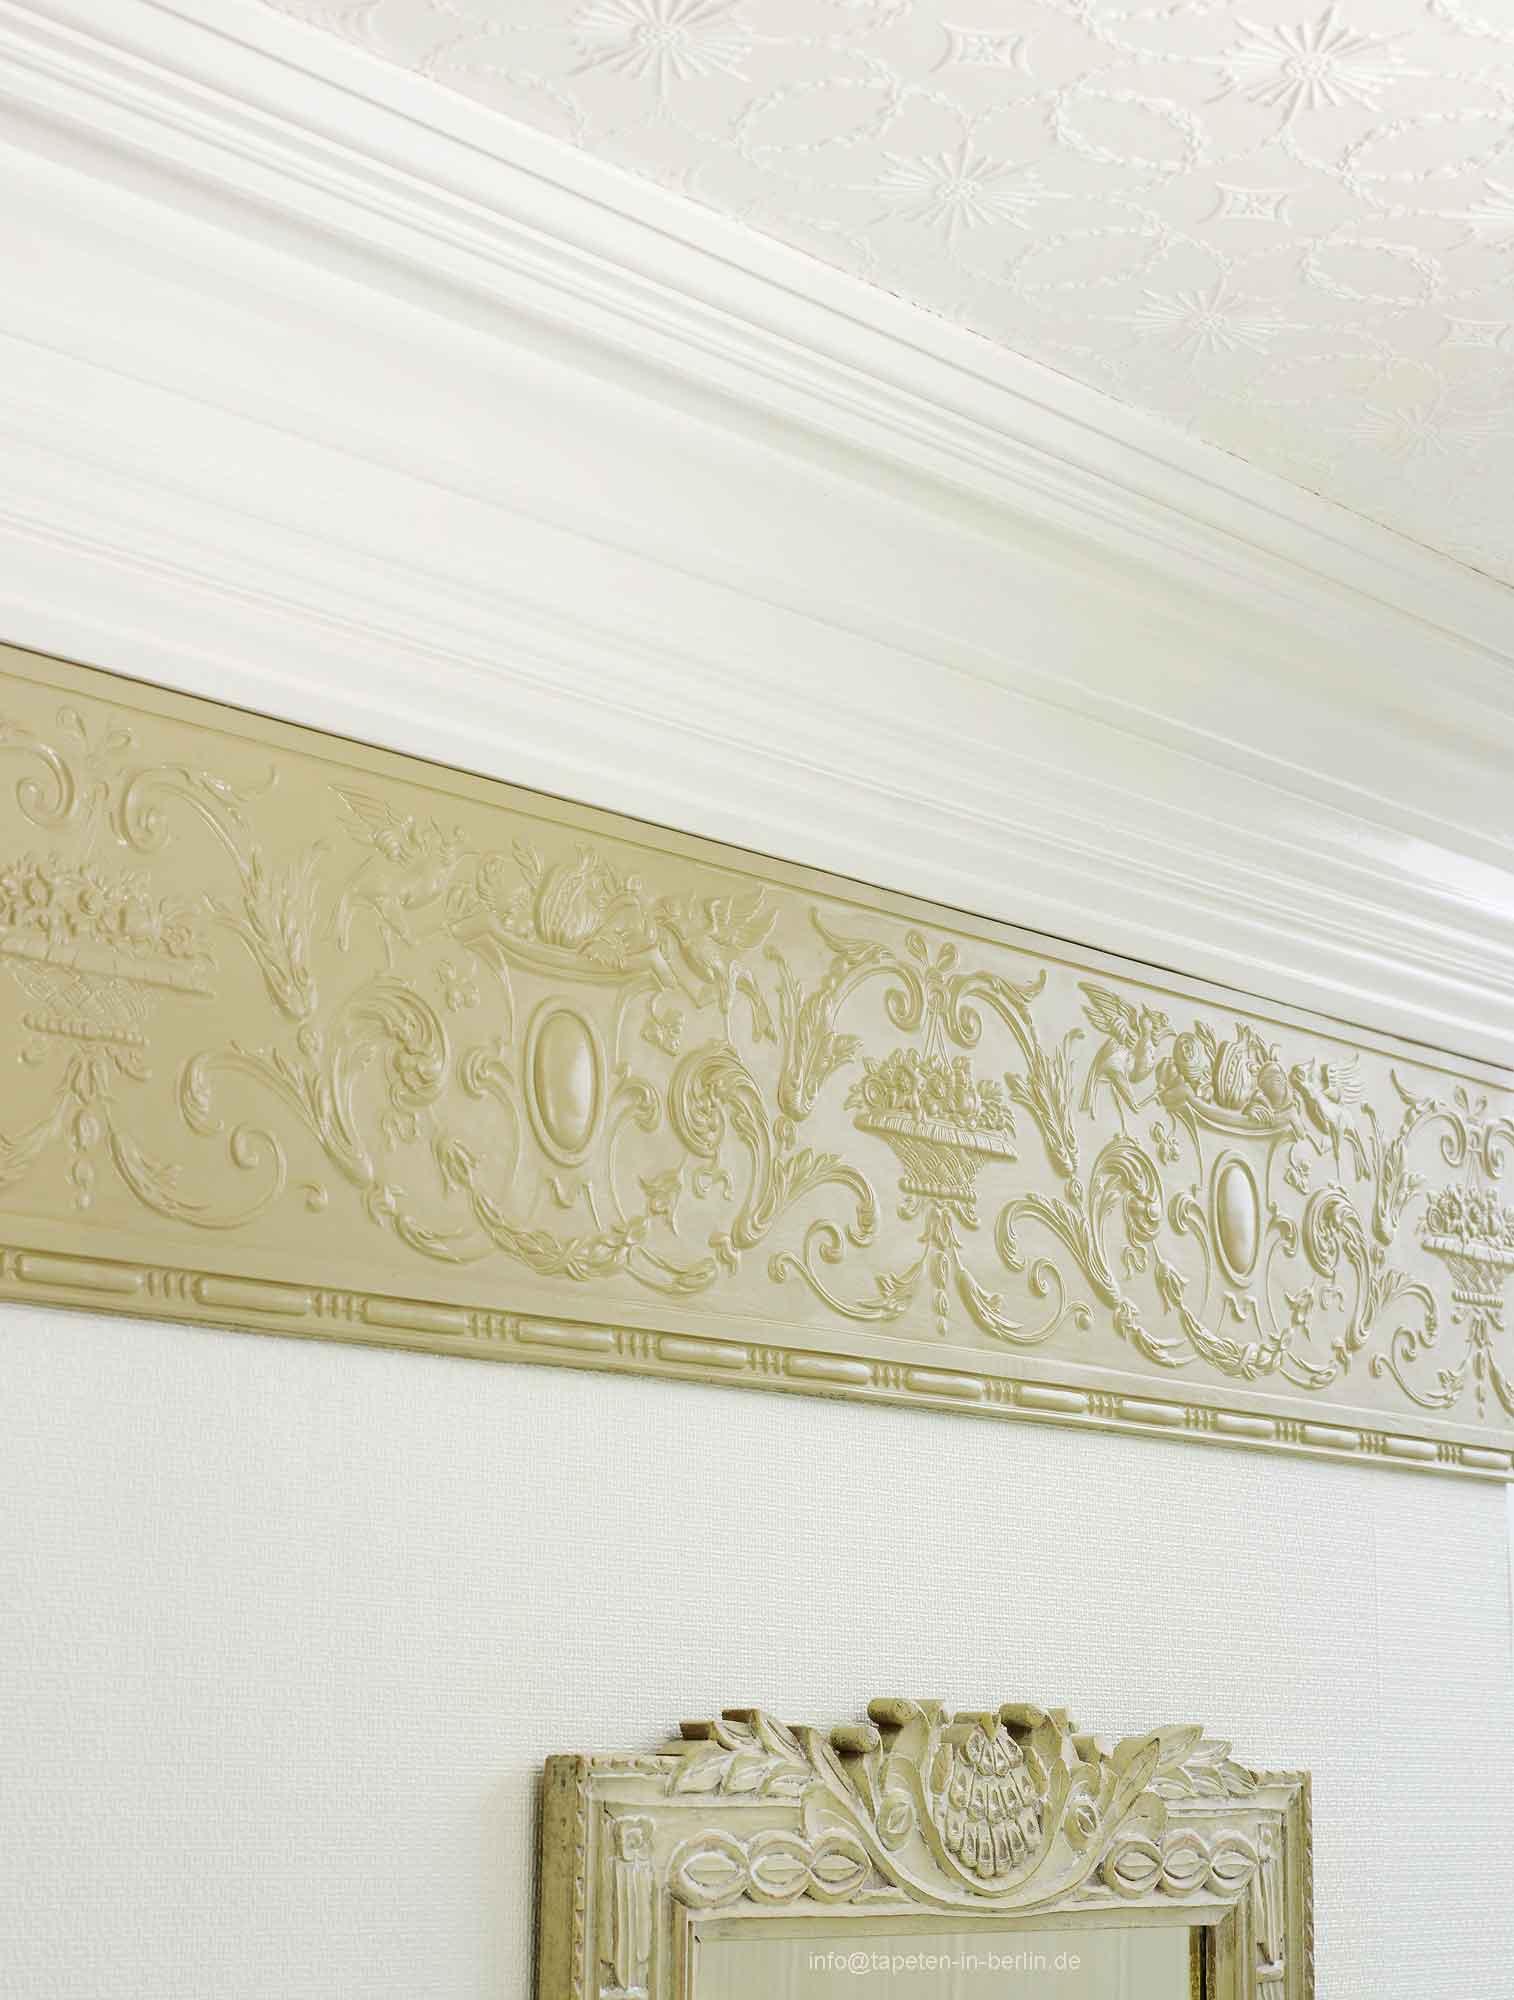 Lincrusta Tapete images of wallpaper border fan